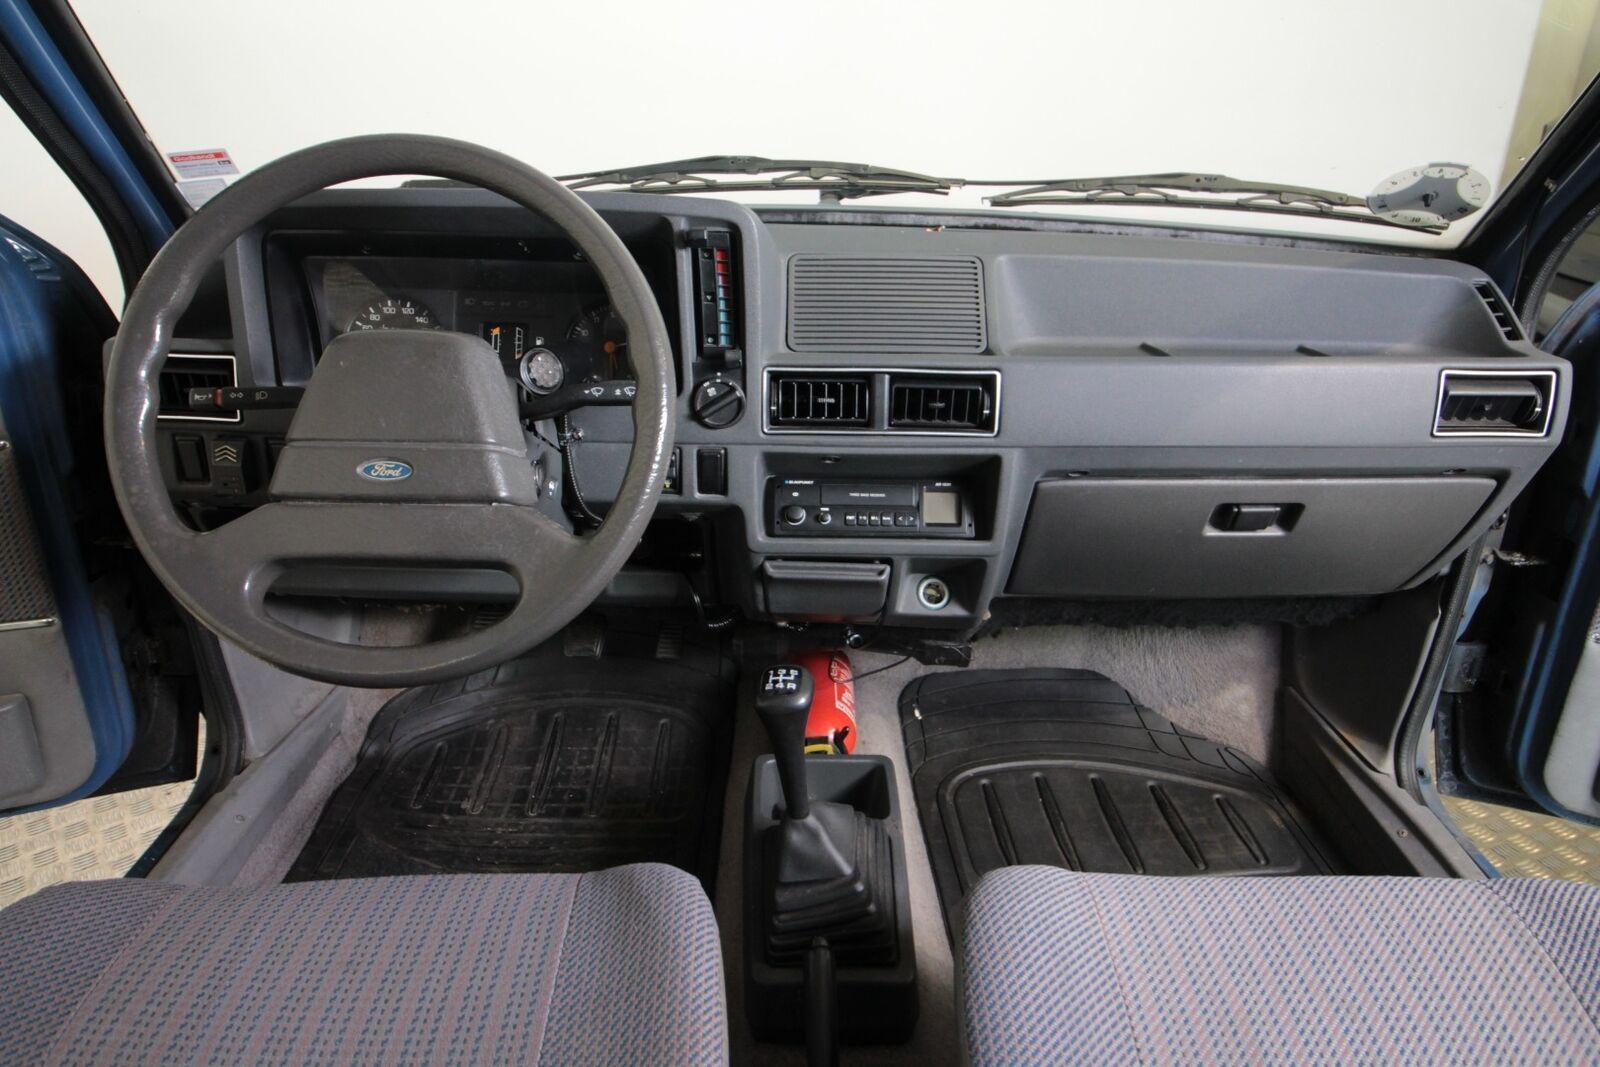 Ford Escort Laser